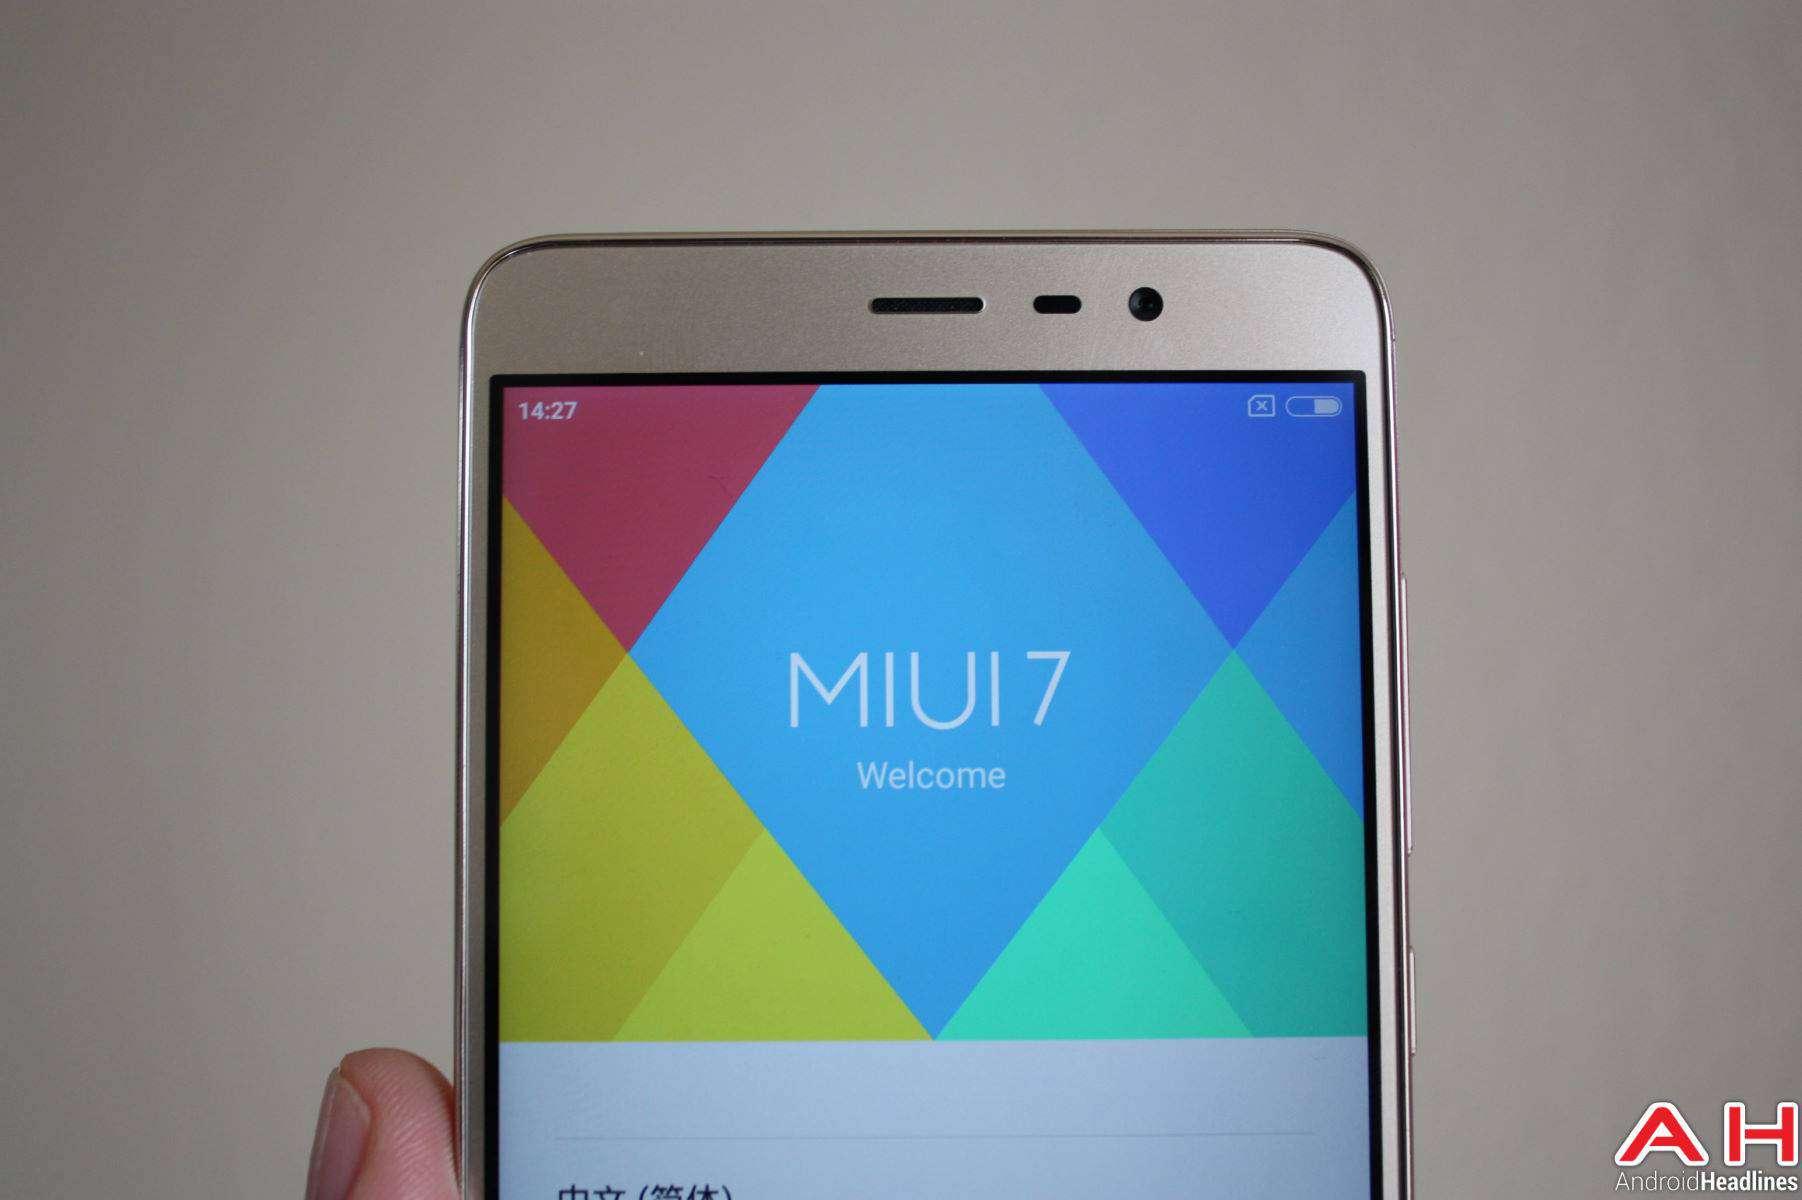 Xiaomi Redmi Note 3 MIUI 7 AH-4